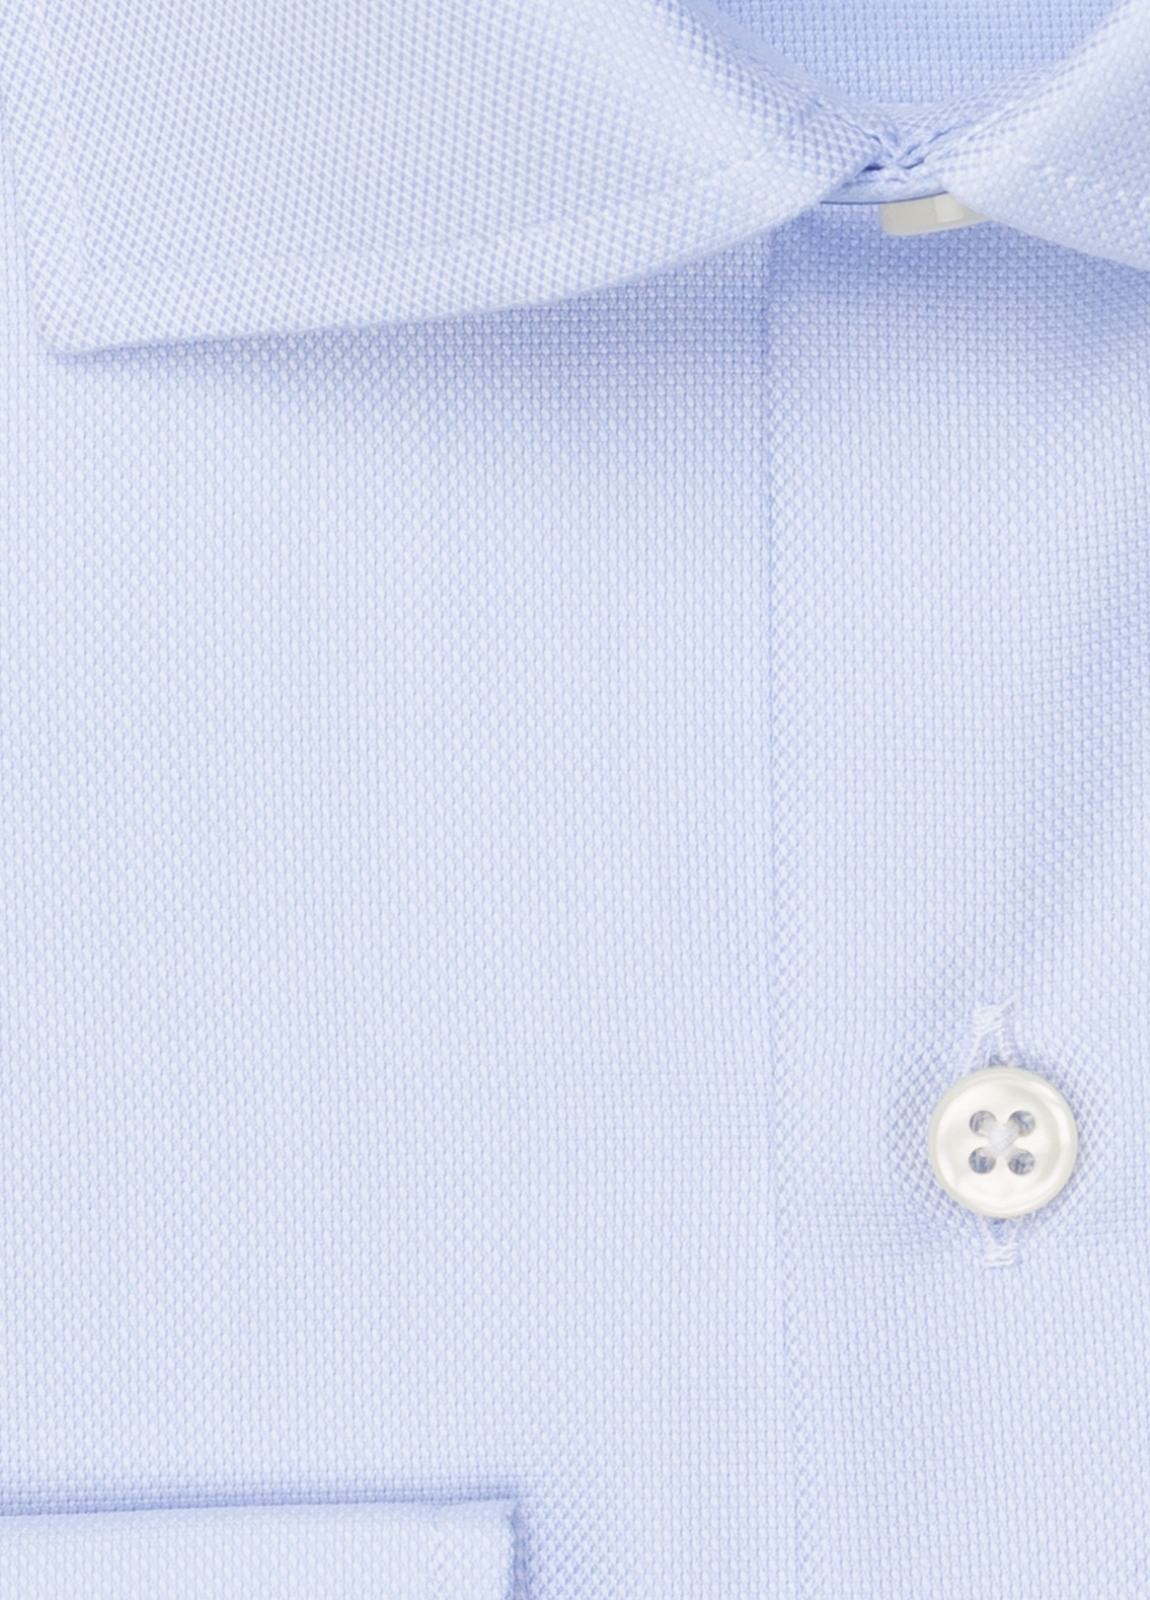 Camisa vestir FUREST COLECCIÓN SLIM FIT cuello italiano celeste - Ítem2